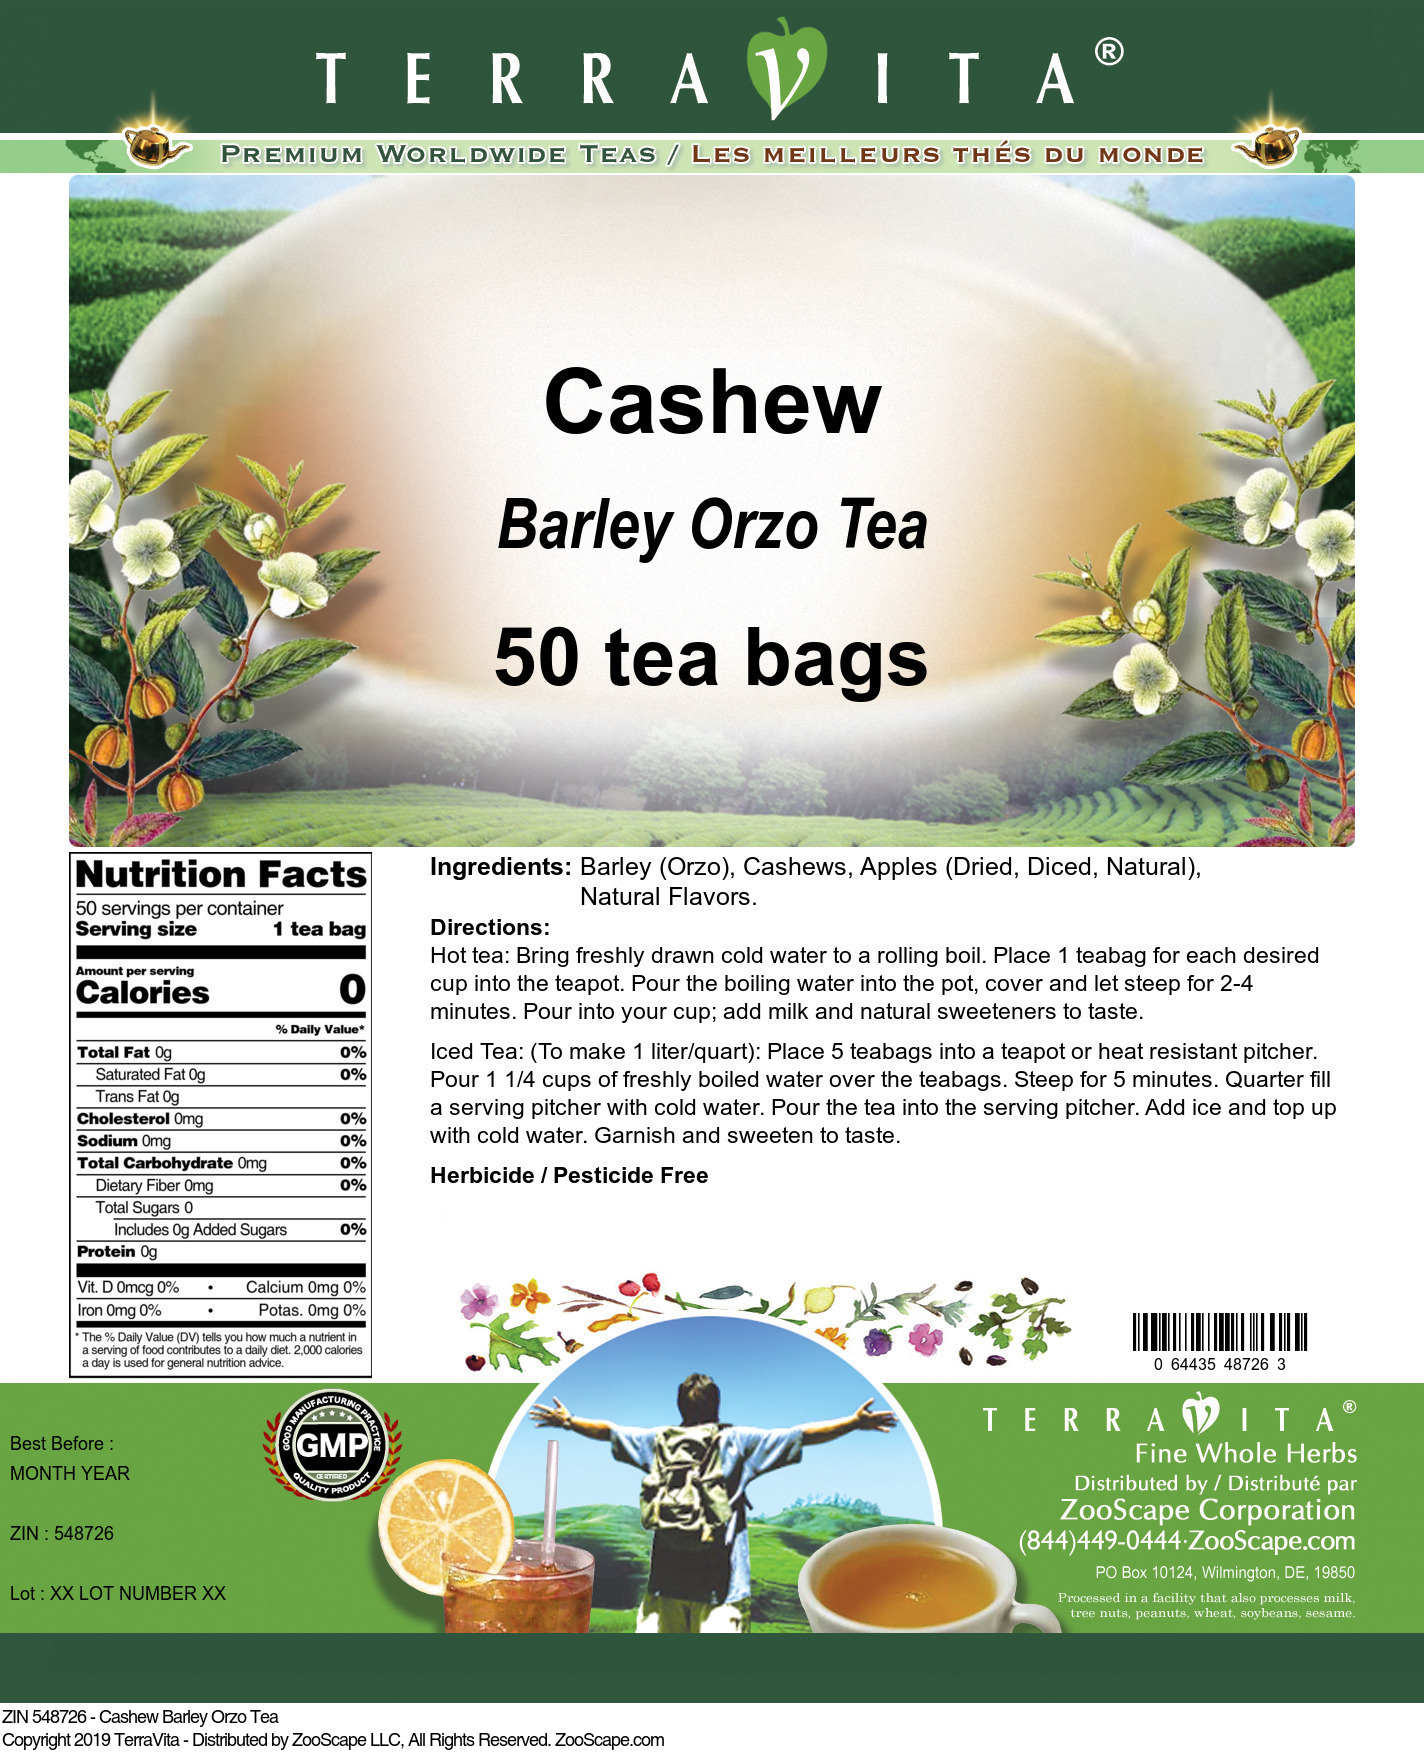 Cashew Barley Orzo